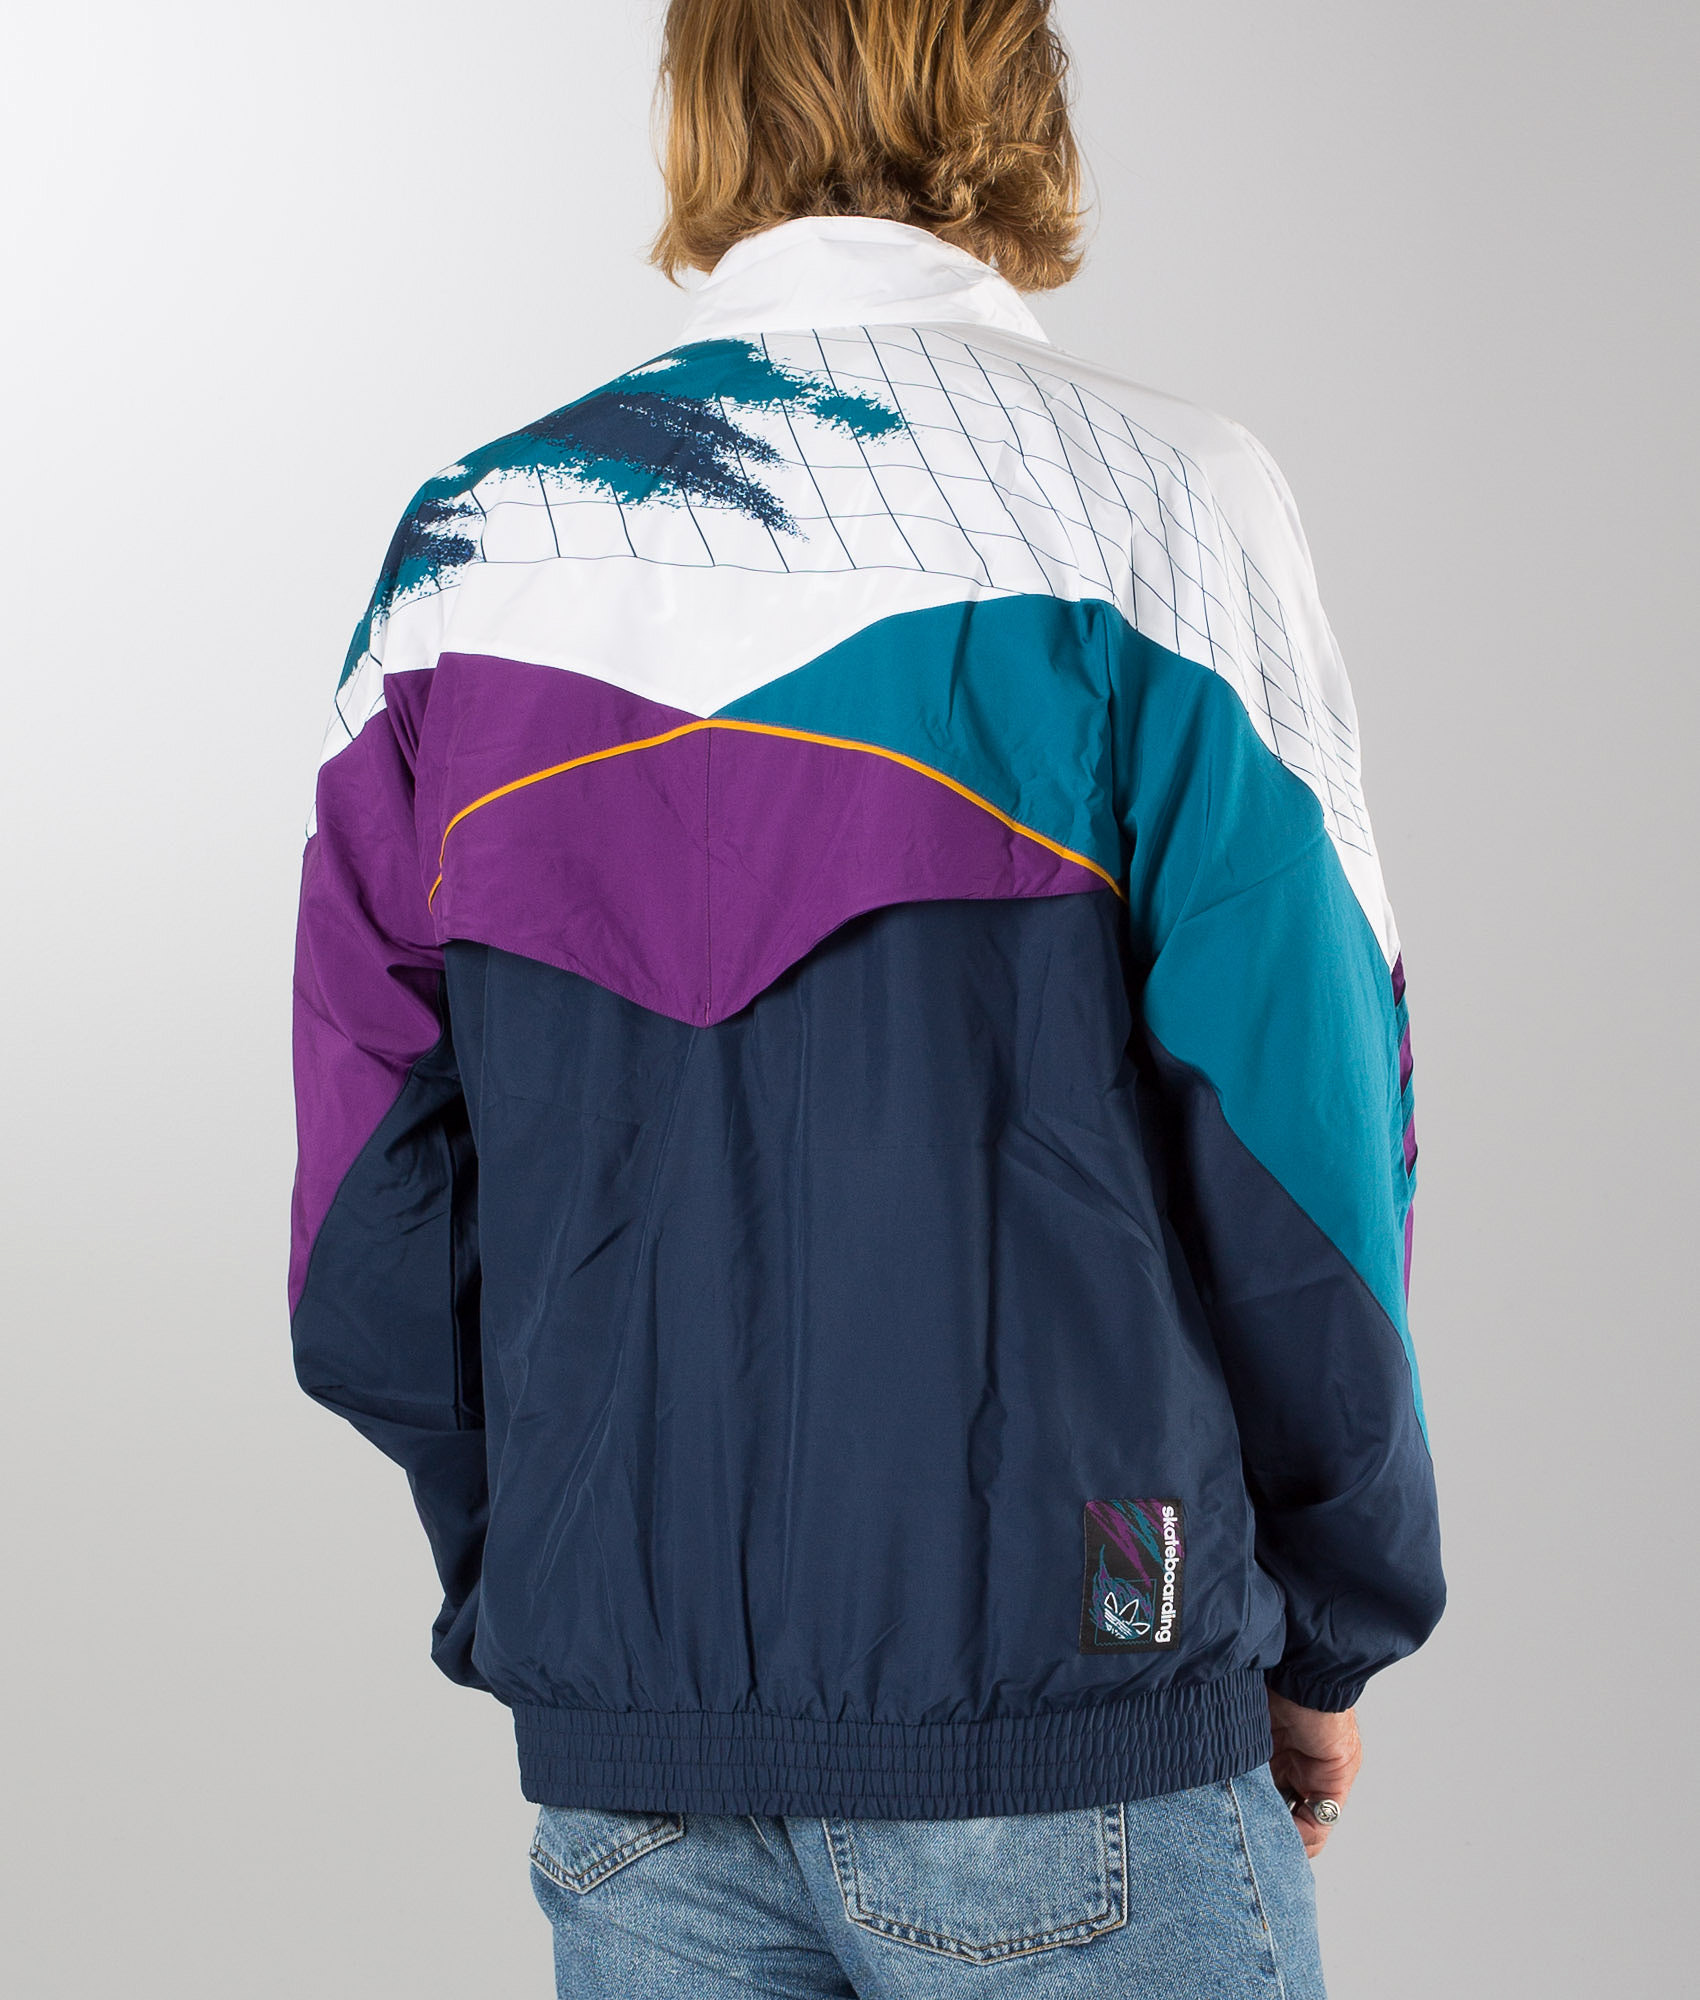 c7b90c369b81 Adidas Skateboarding Court Jacket White/Collgegiate Navy/Tribe Purple/